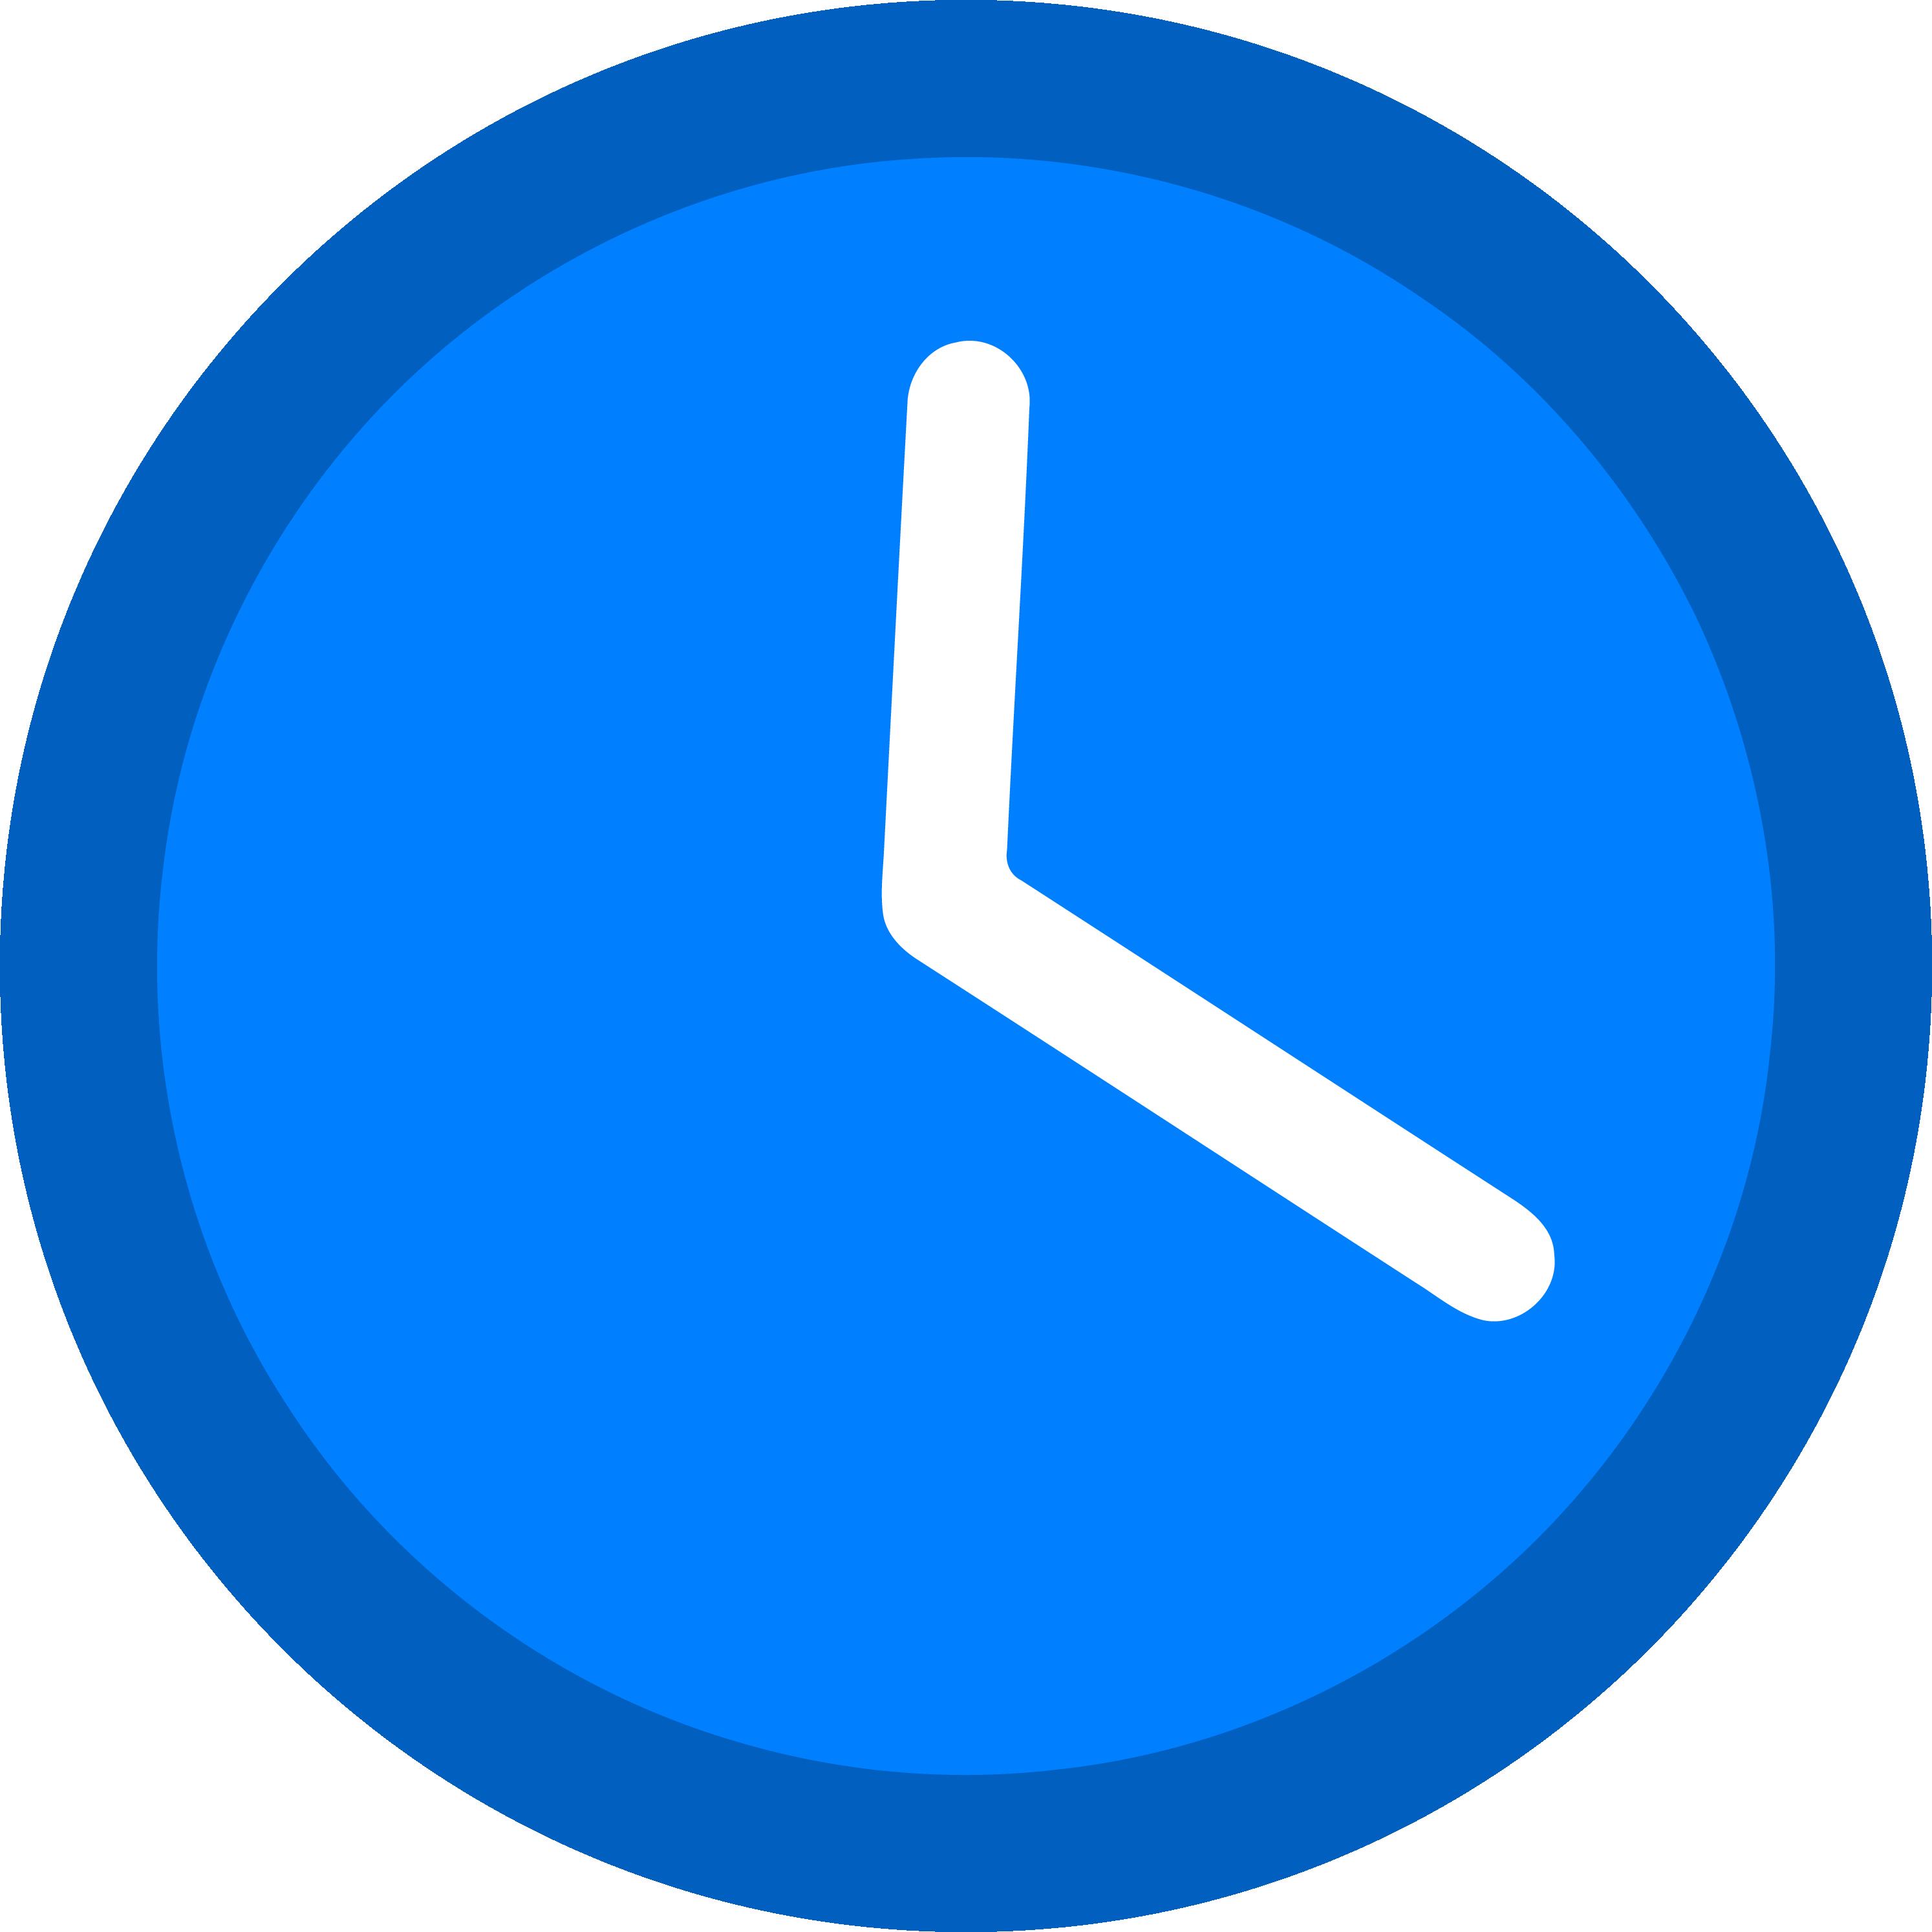 Clipart clock circle. Hd md dodger blue